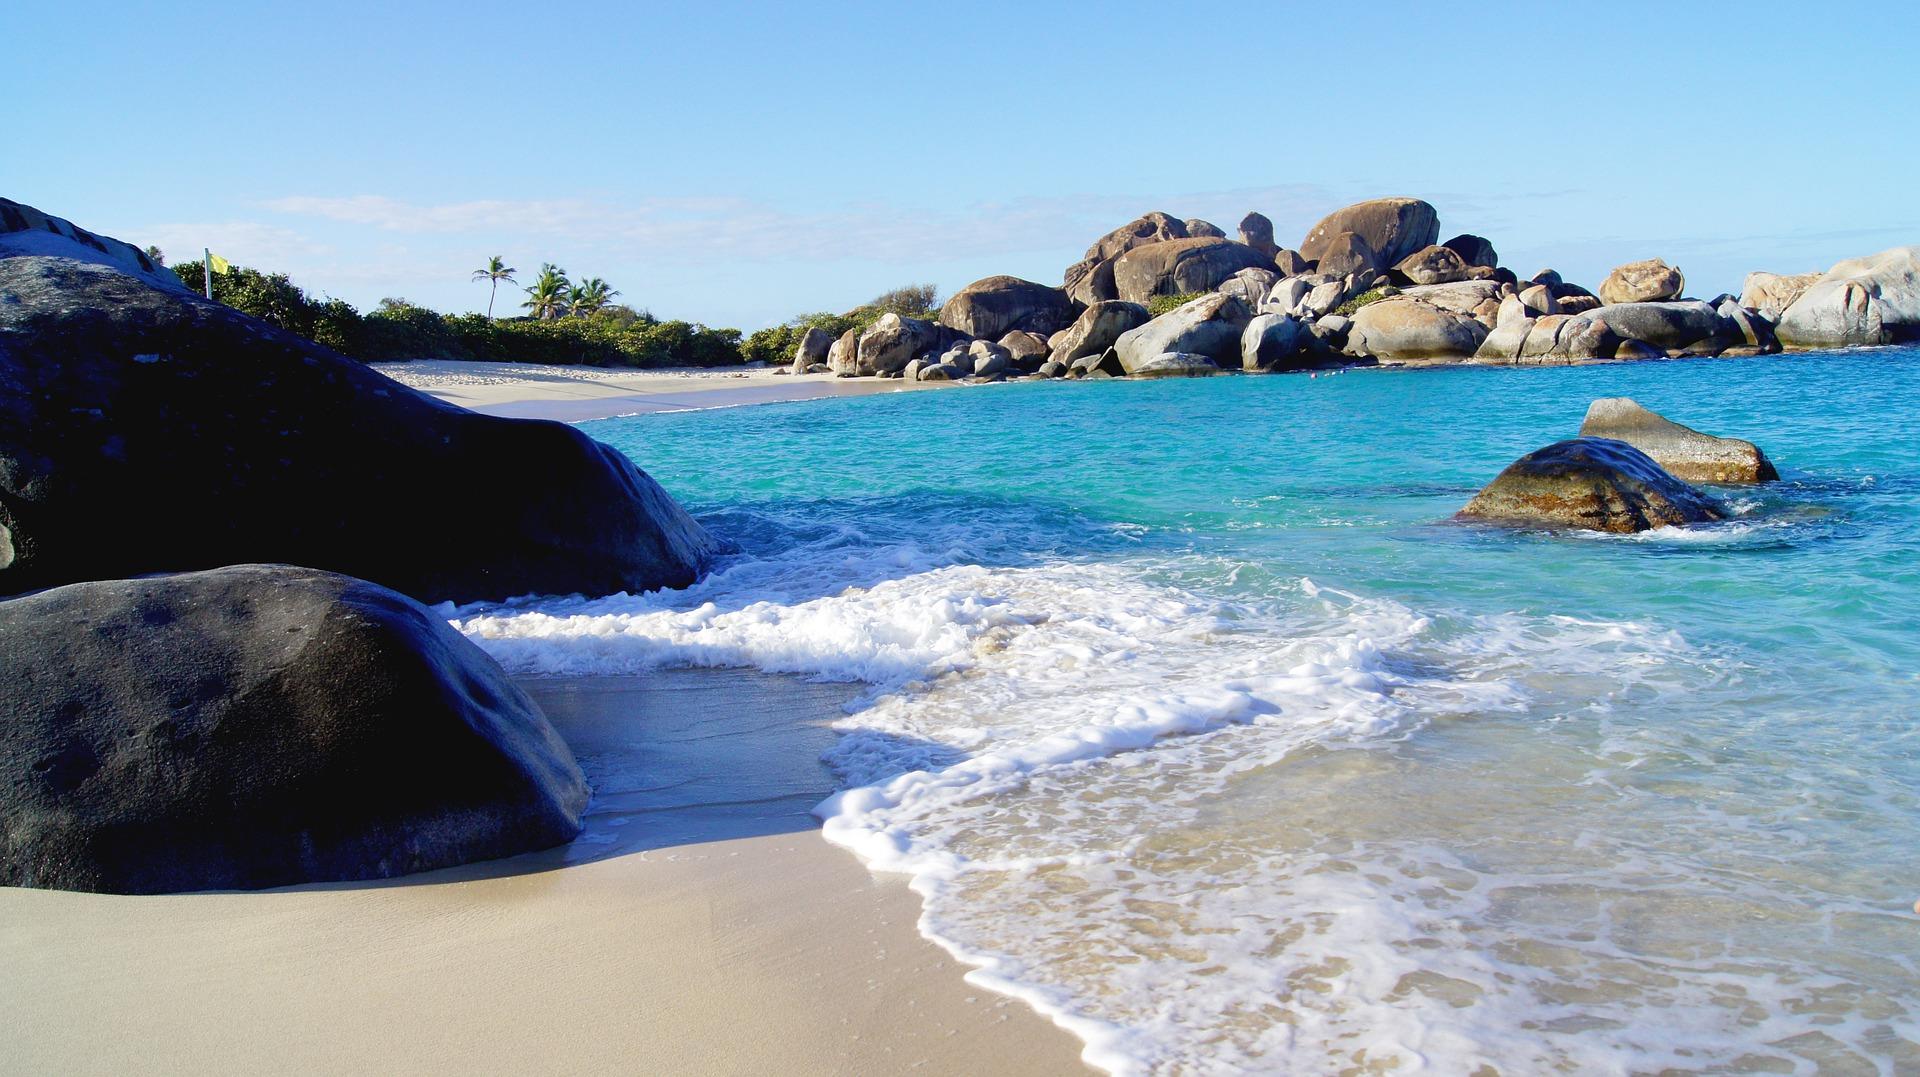 surf washing up on sandy beach in Virgin Gorda with rocks along the beach